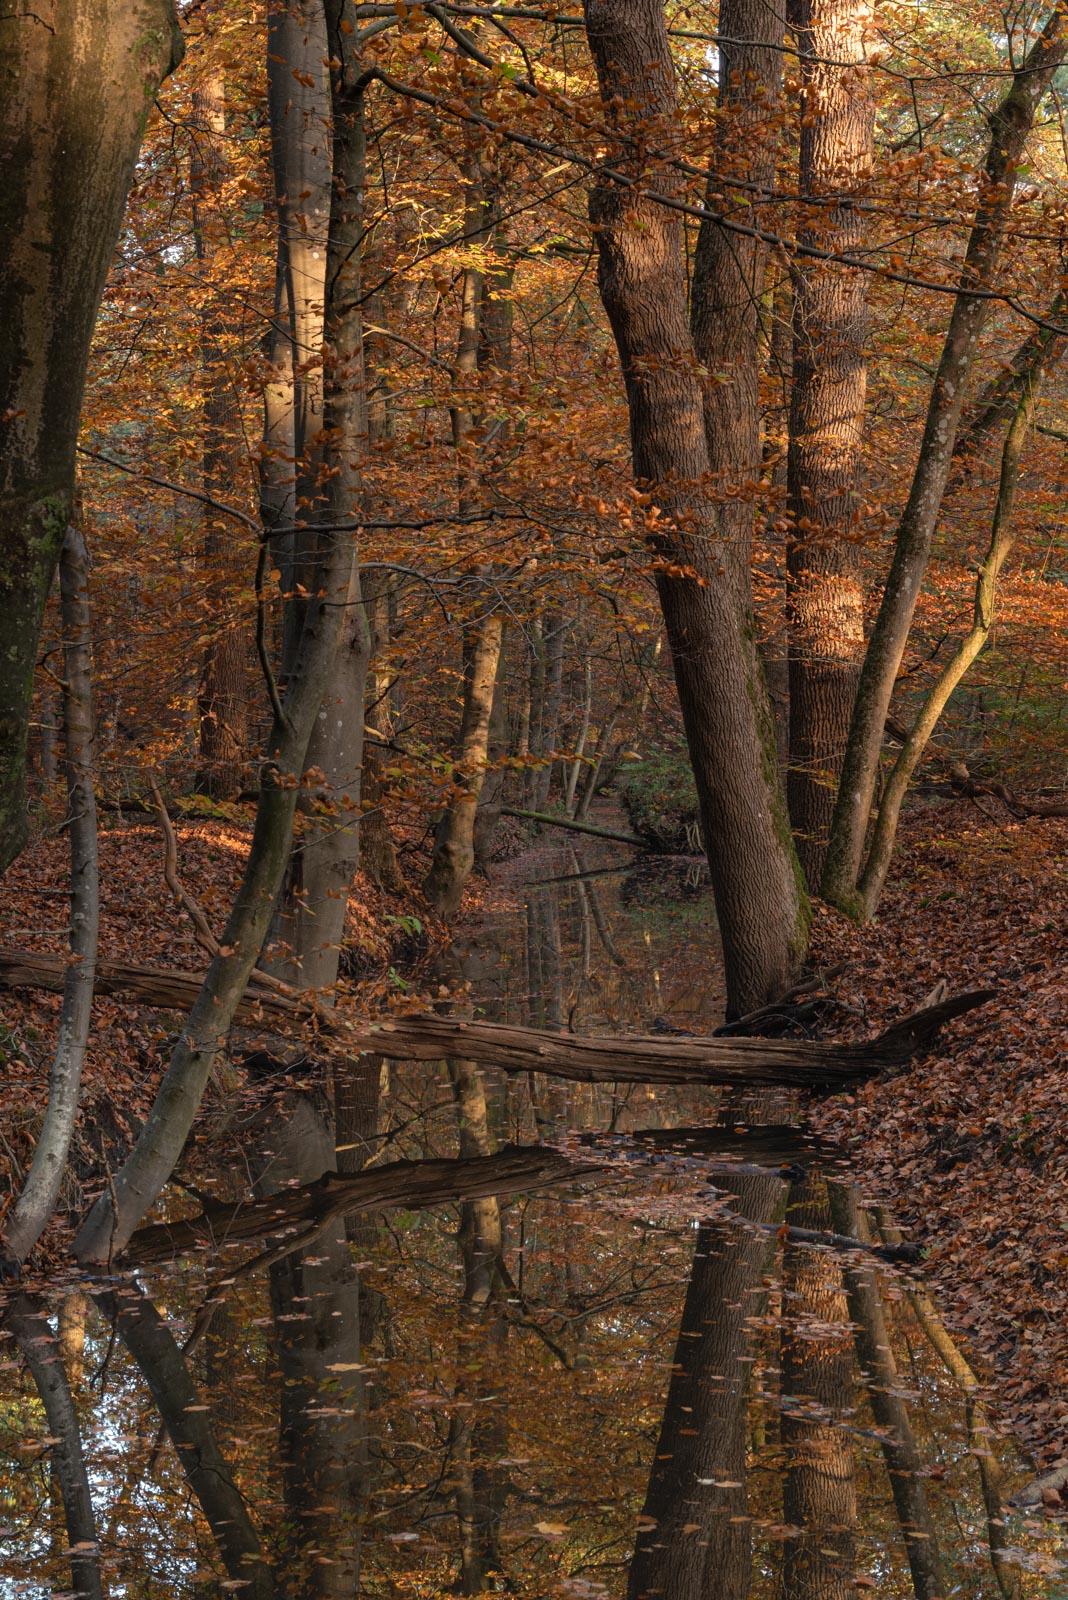 Leuvenumse Bos in de vroege ochtend zon 4920